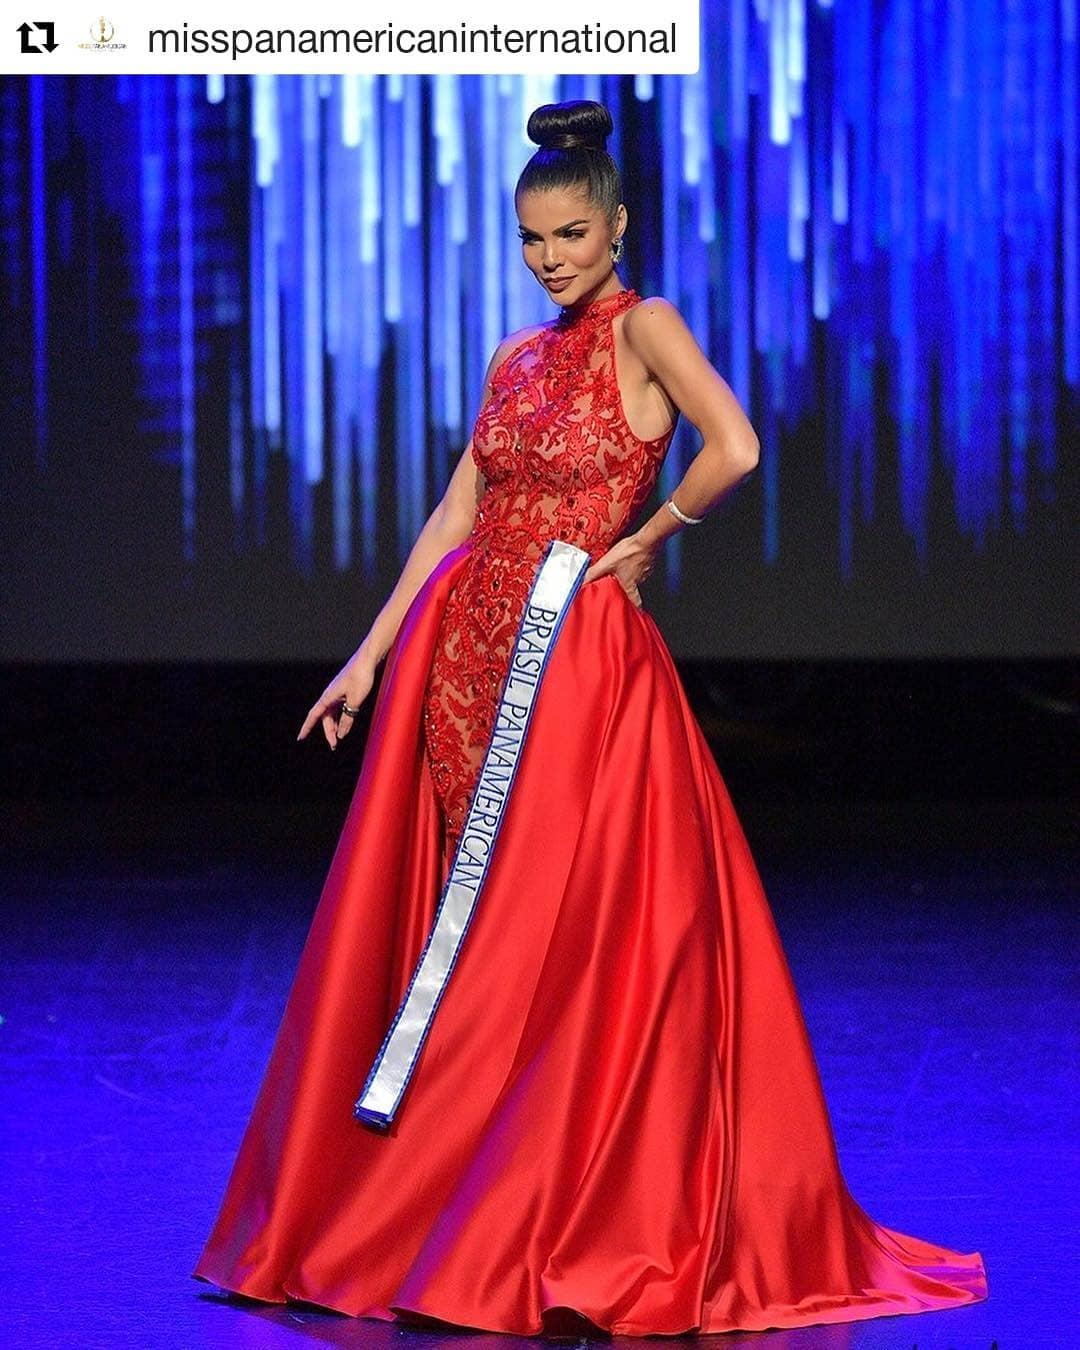 MISS ASIA PACIFIC INTERNATIONAL 2017/MISS PANAMERICAN INTERNATIONAL 2018. - Página 9 43419210